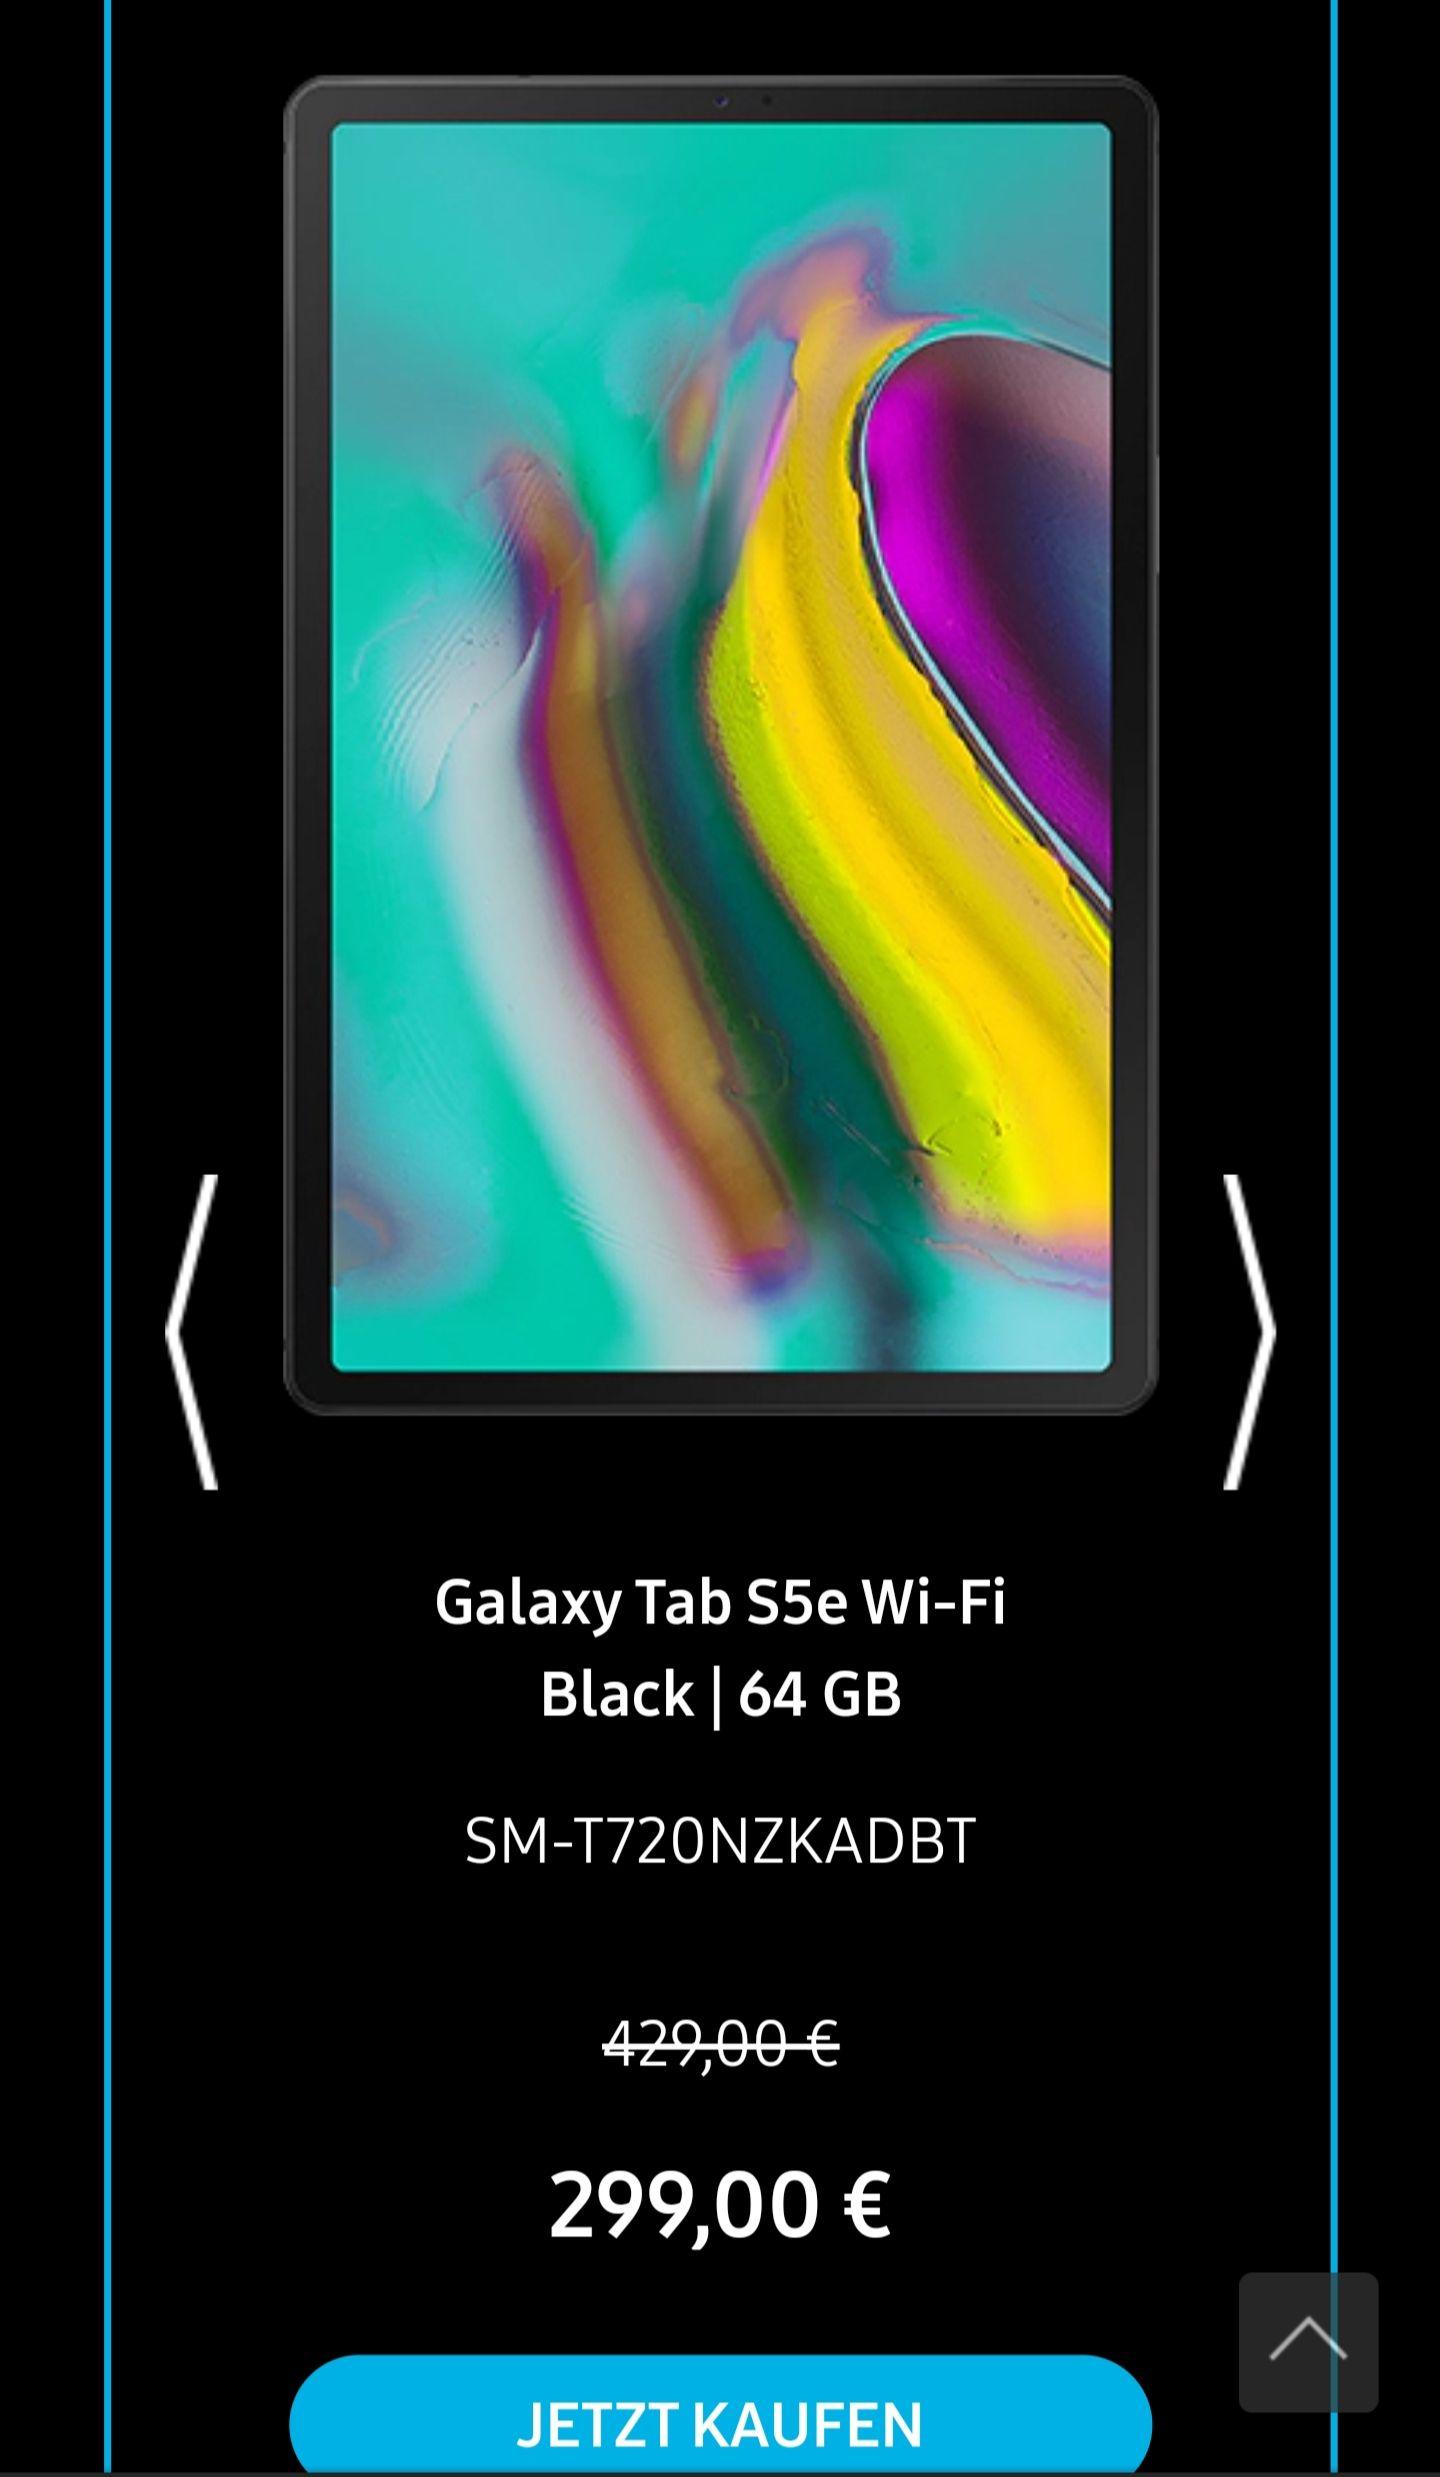 Samsung Galaxy Tab S5e 64gb (Wifi) / #SamsungBlackWeeks